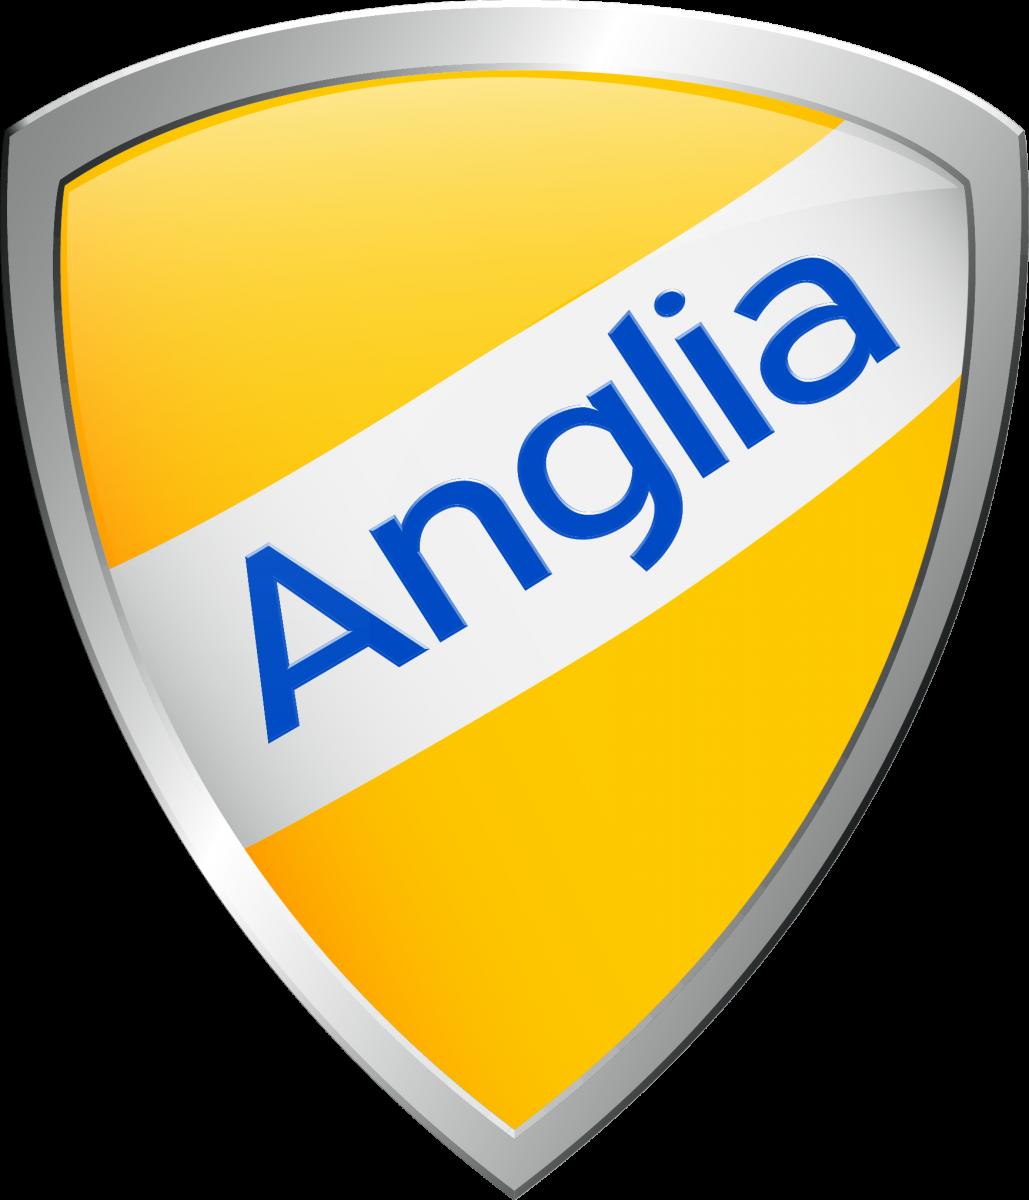 Anlia shield logo